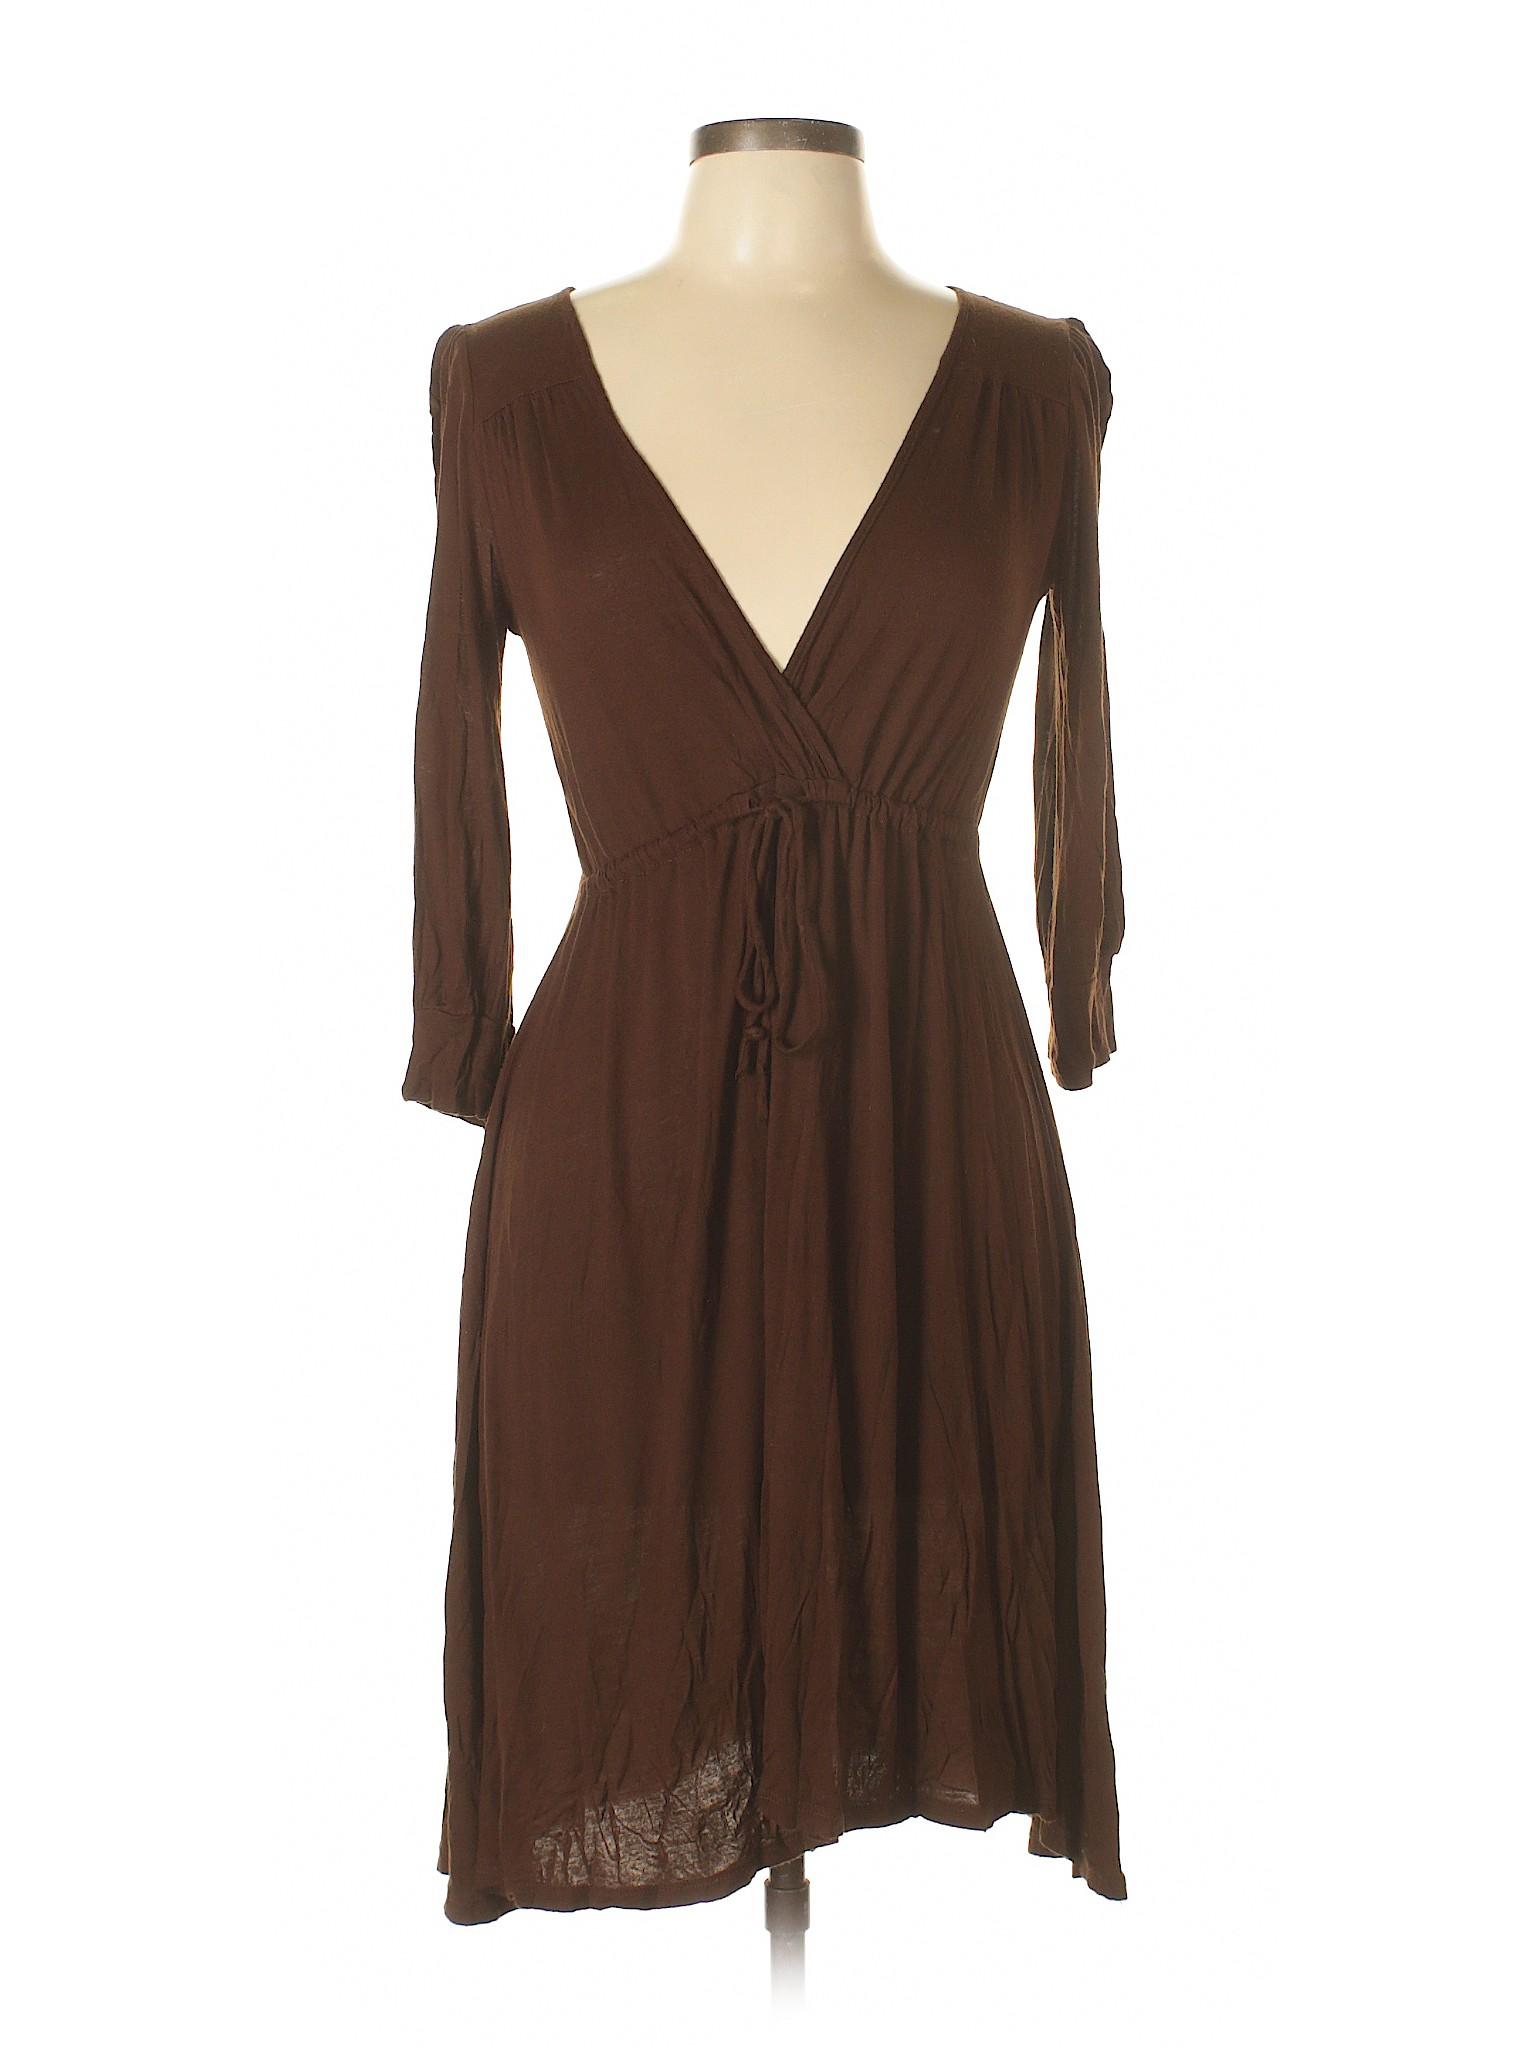 Casual Casual Selling Lani Dress Dress Selling Selling Lani qnP6pFw1